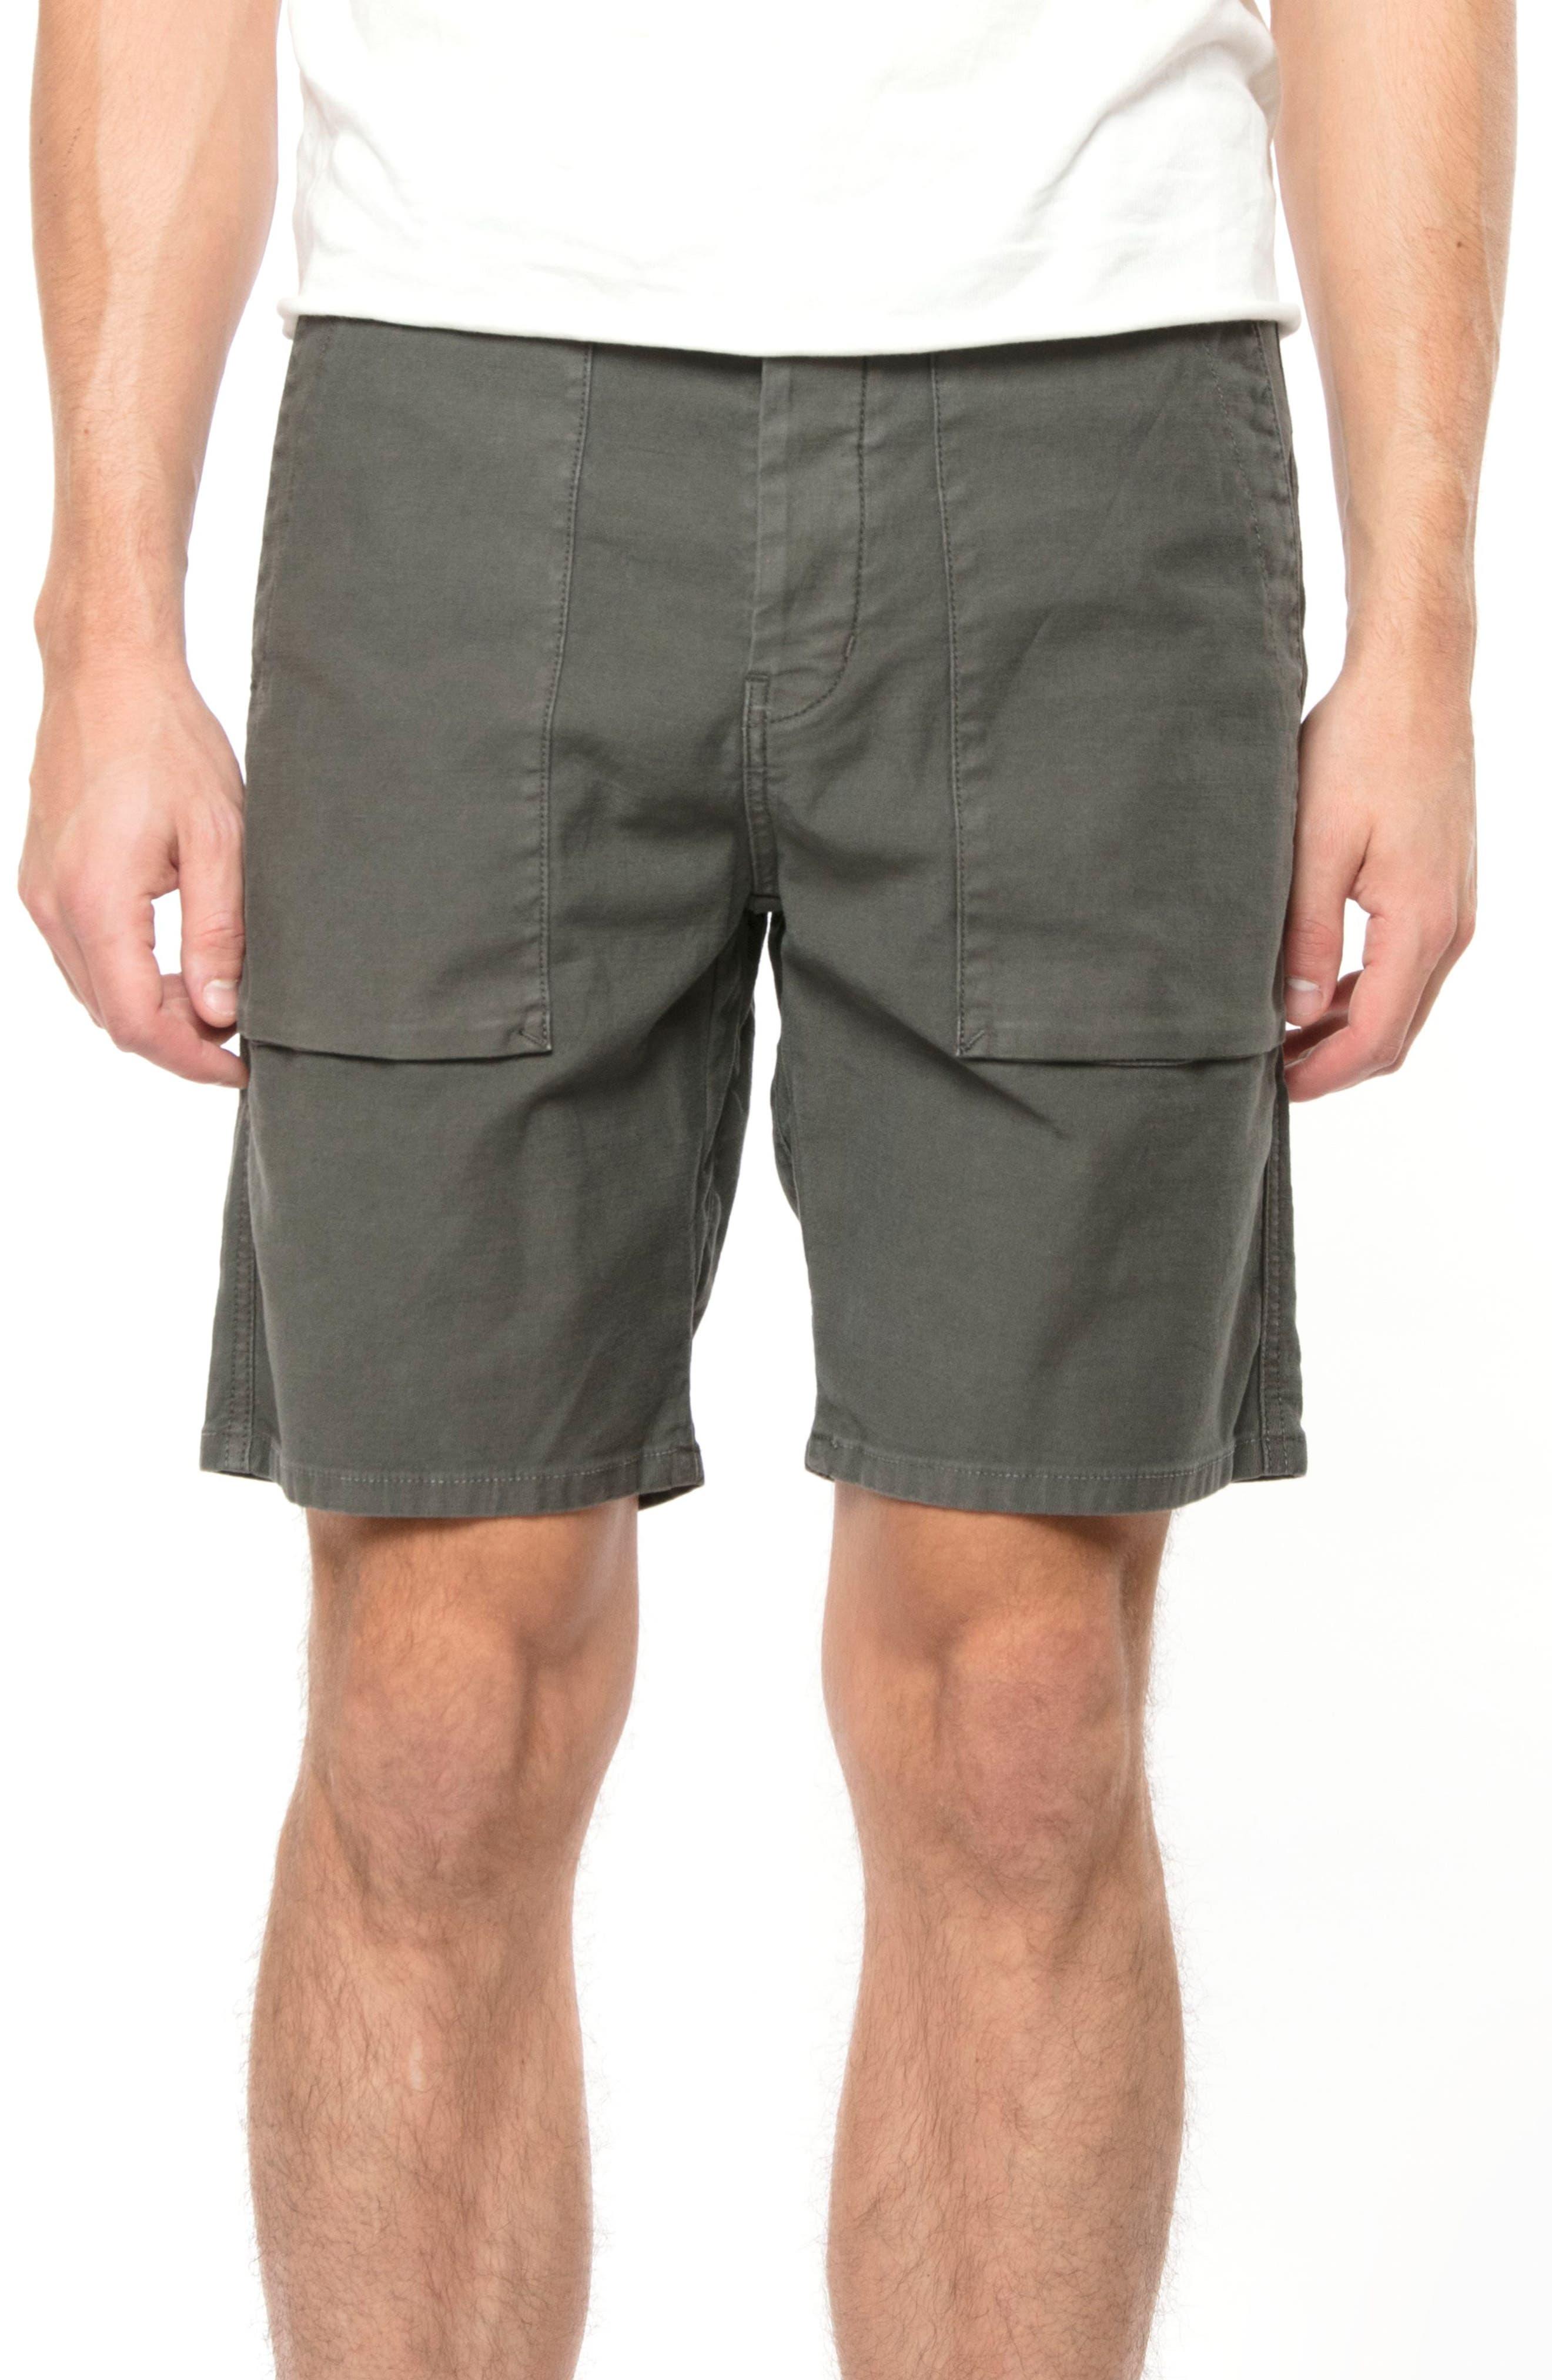 Kontact Shorts,                         Main,                         color, Dull Catapult